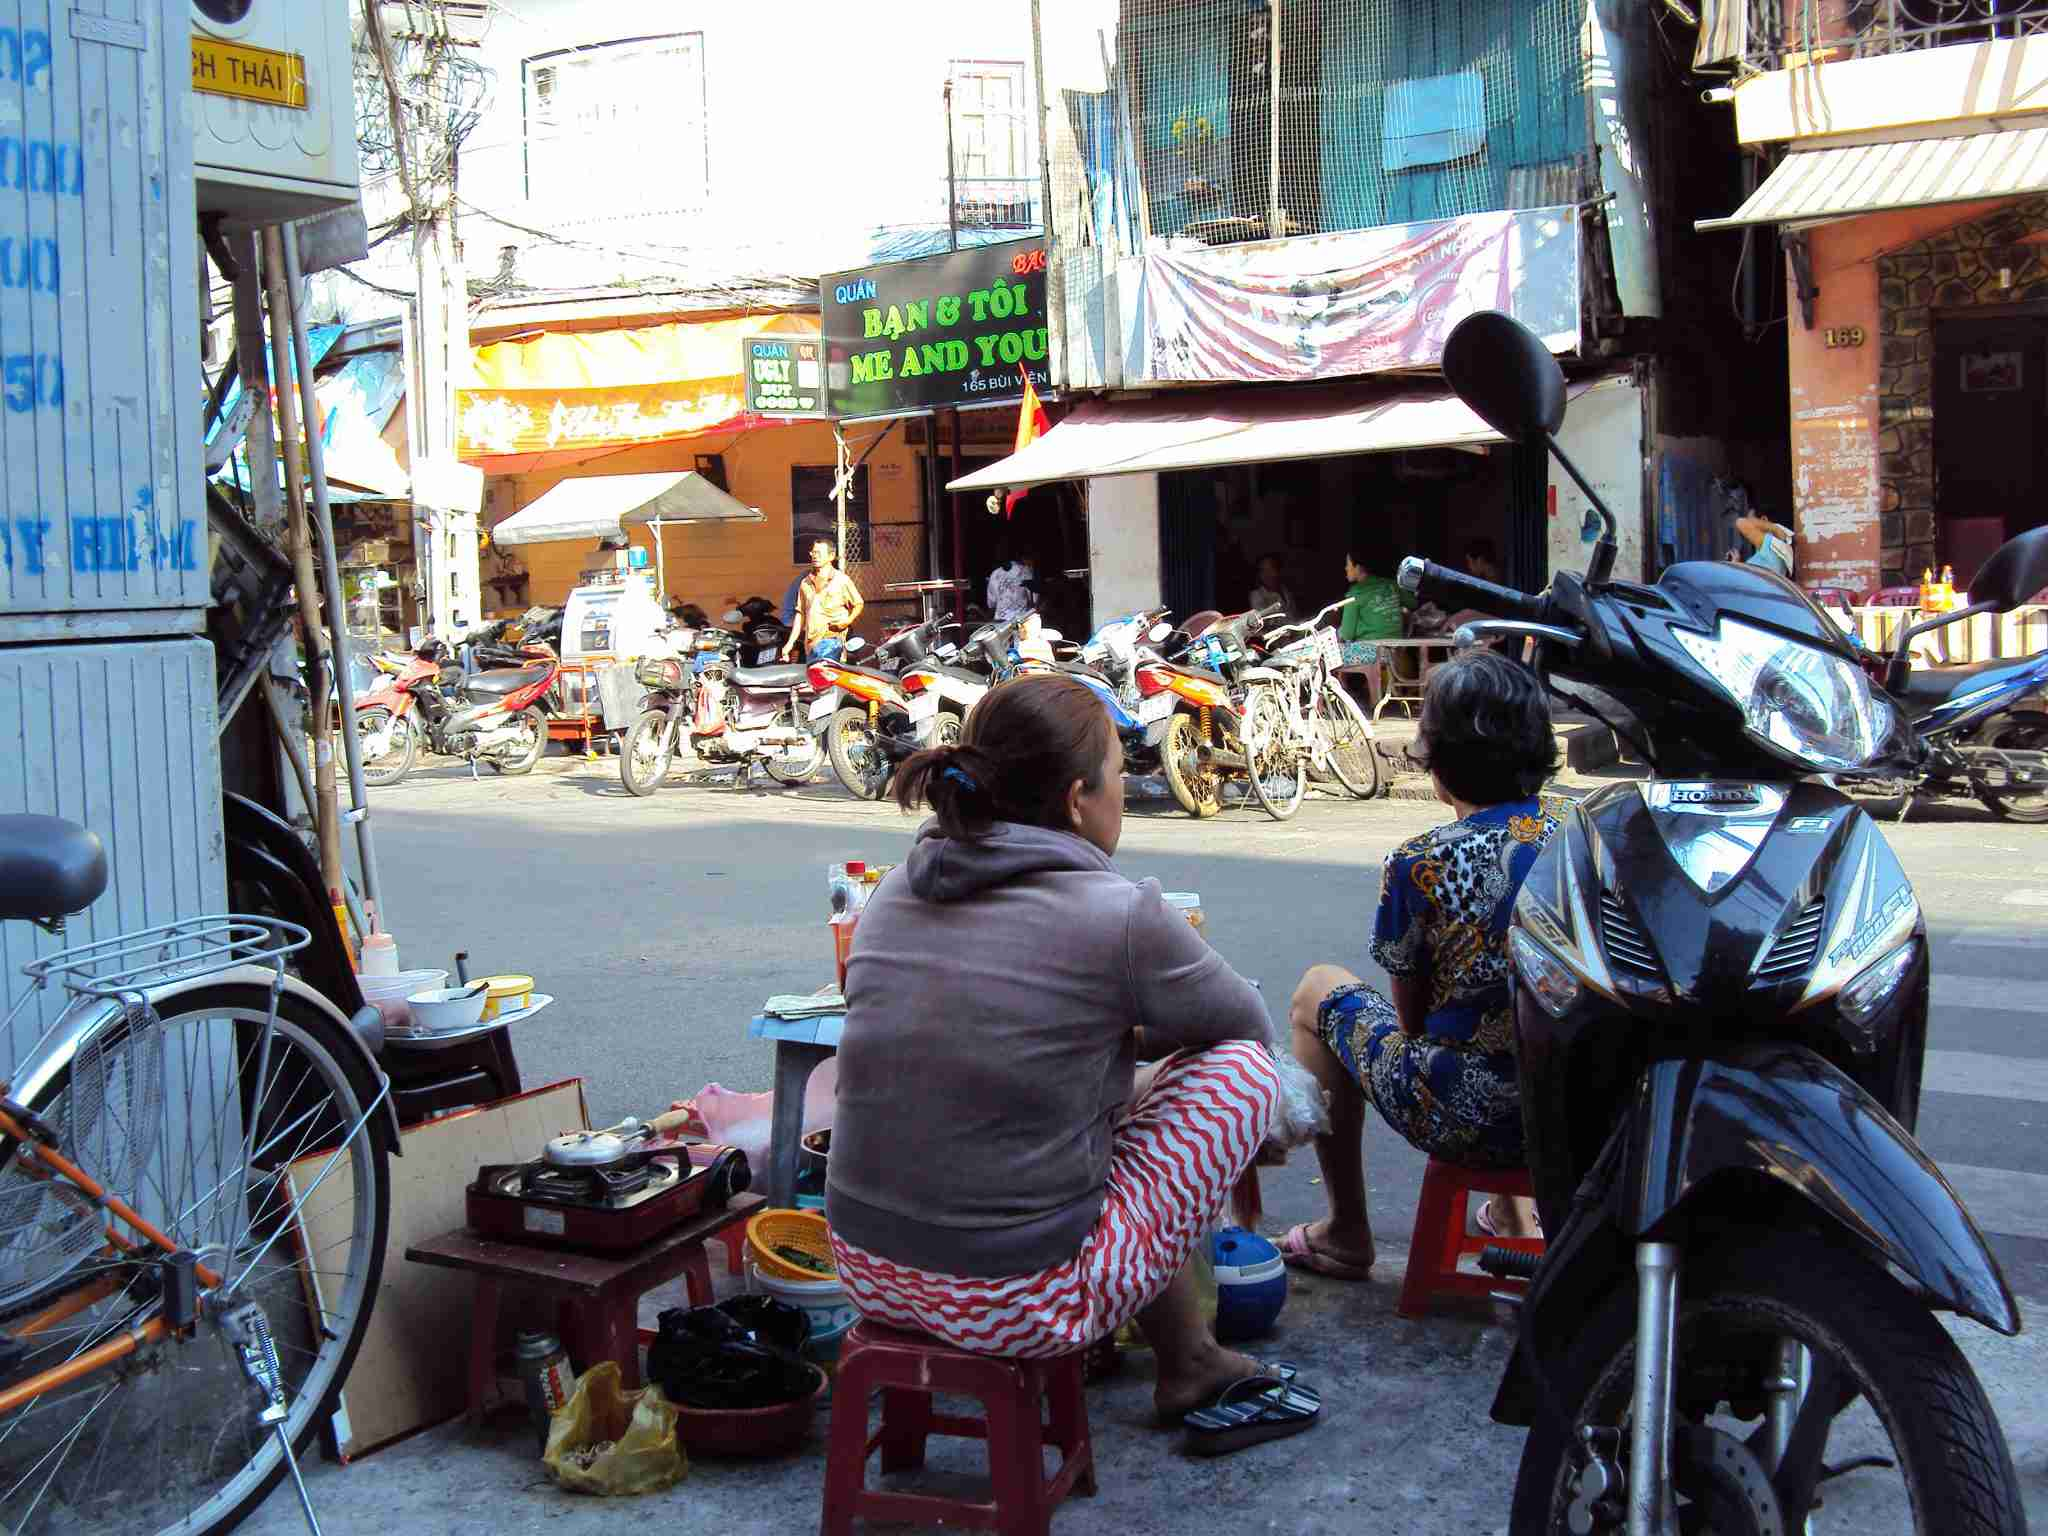 Saigon - offers at the sidewalk